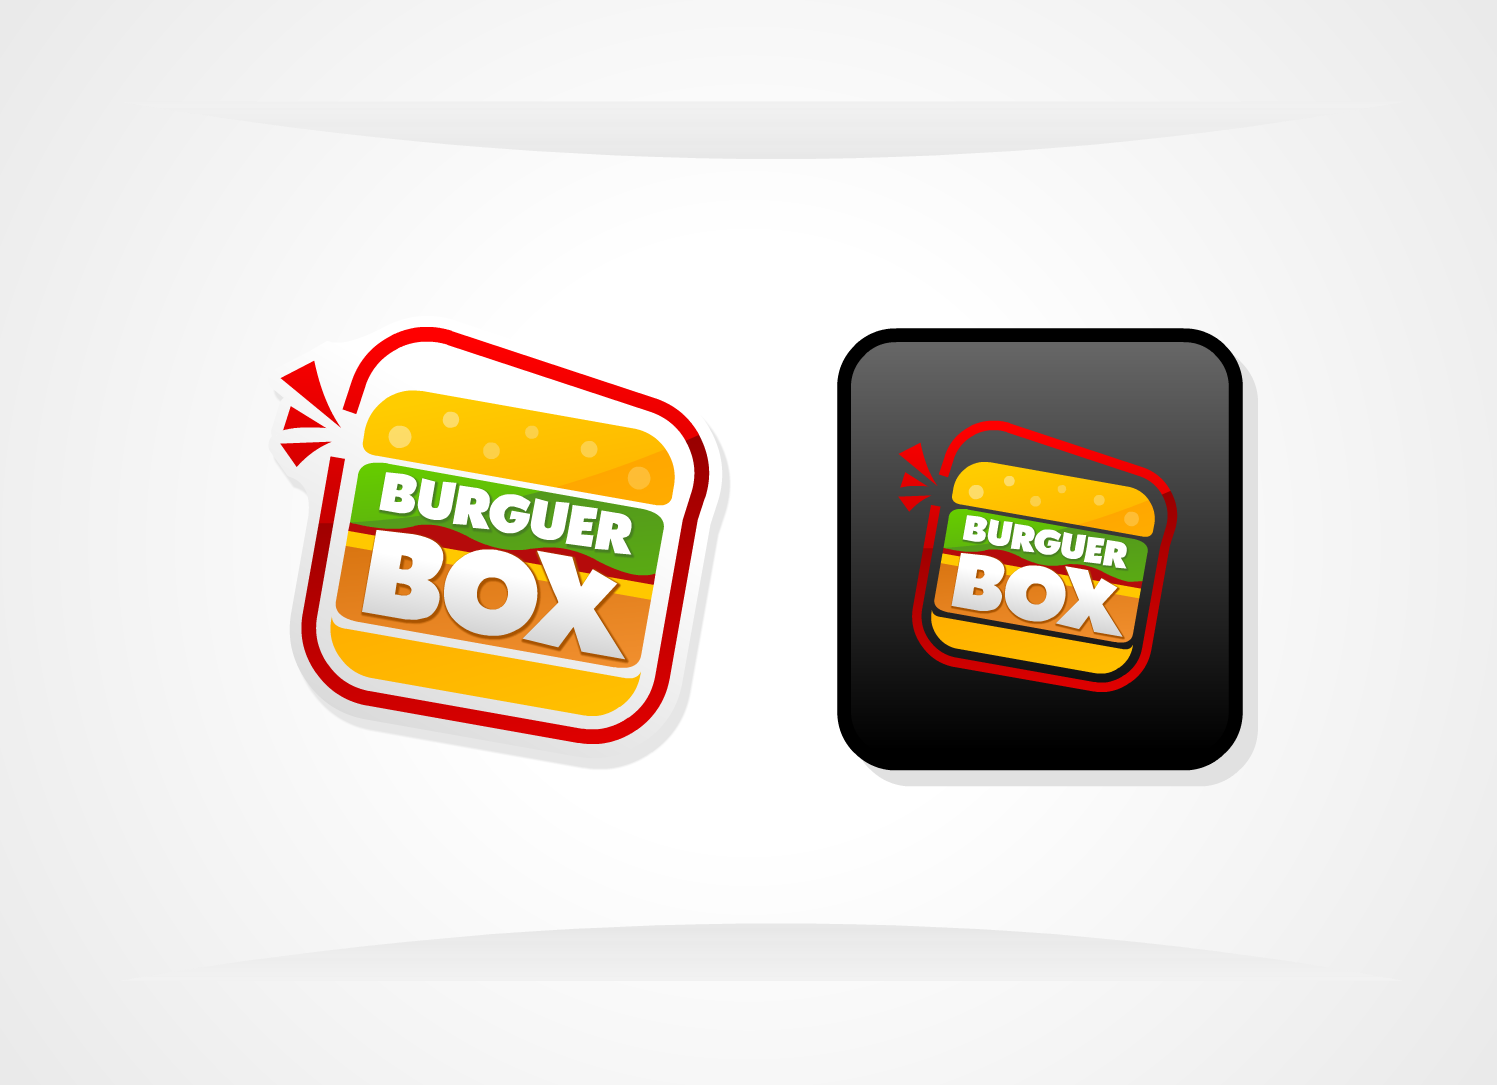 logo for Burger box